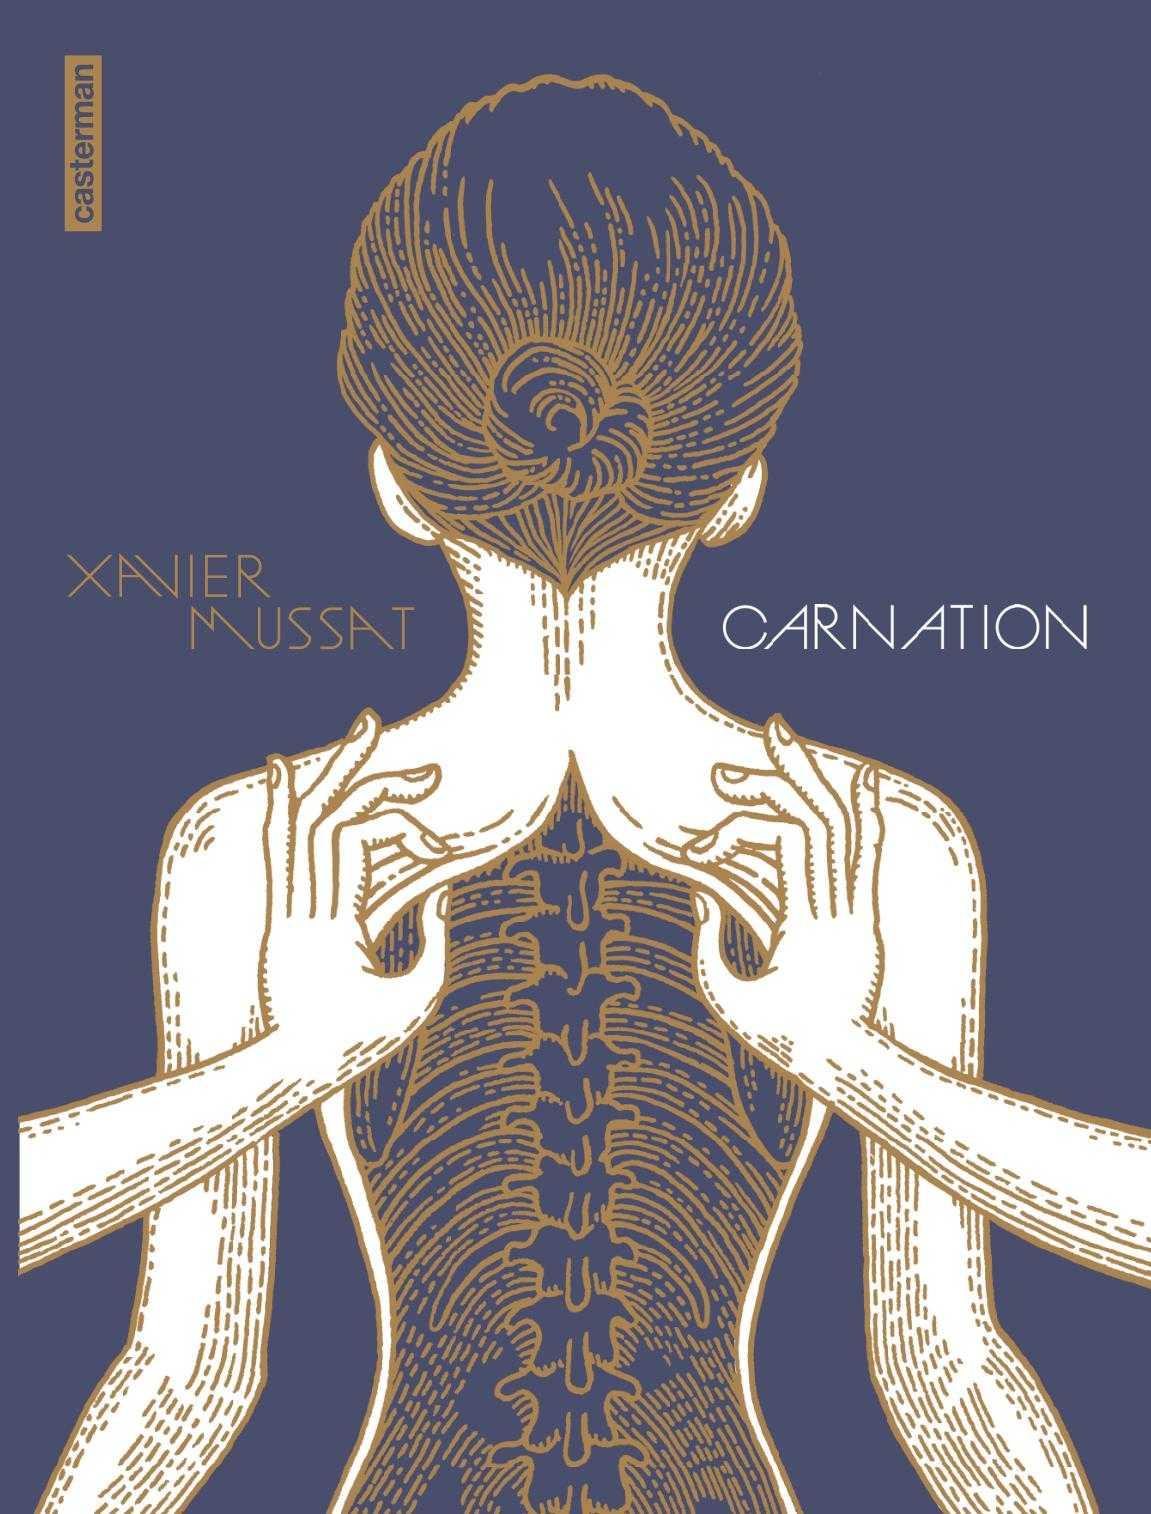 Carnation, la passion selon Xavier Mussat